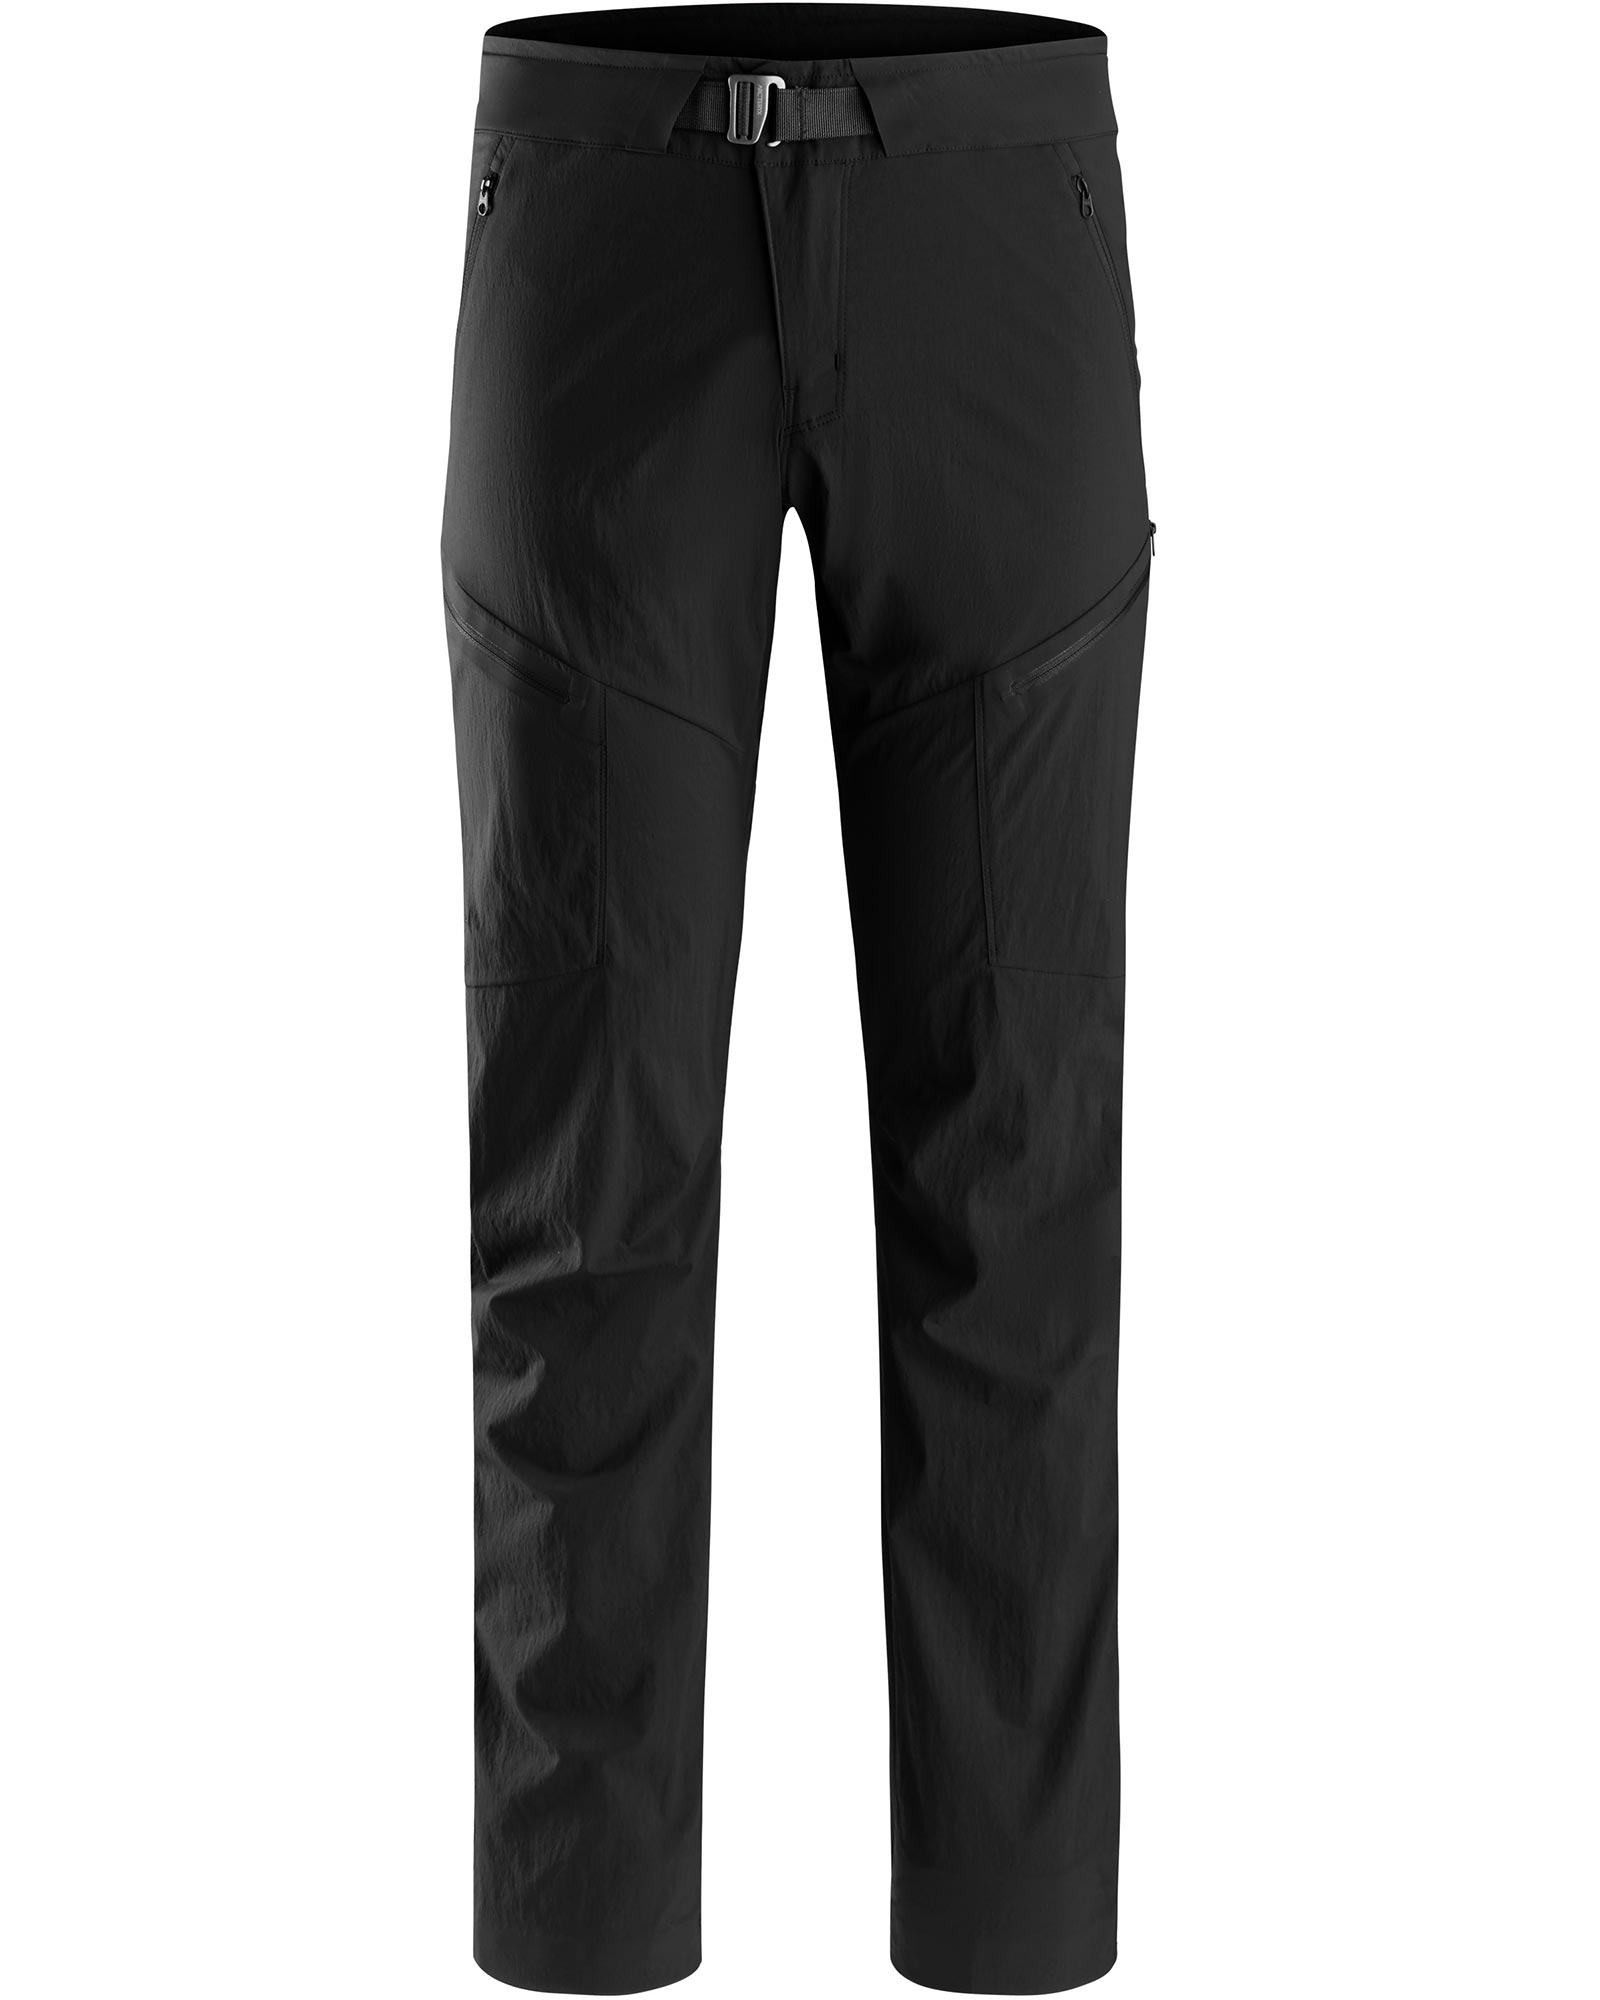 Arc'teryx Men's Palisade Pants Black 0